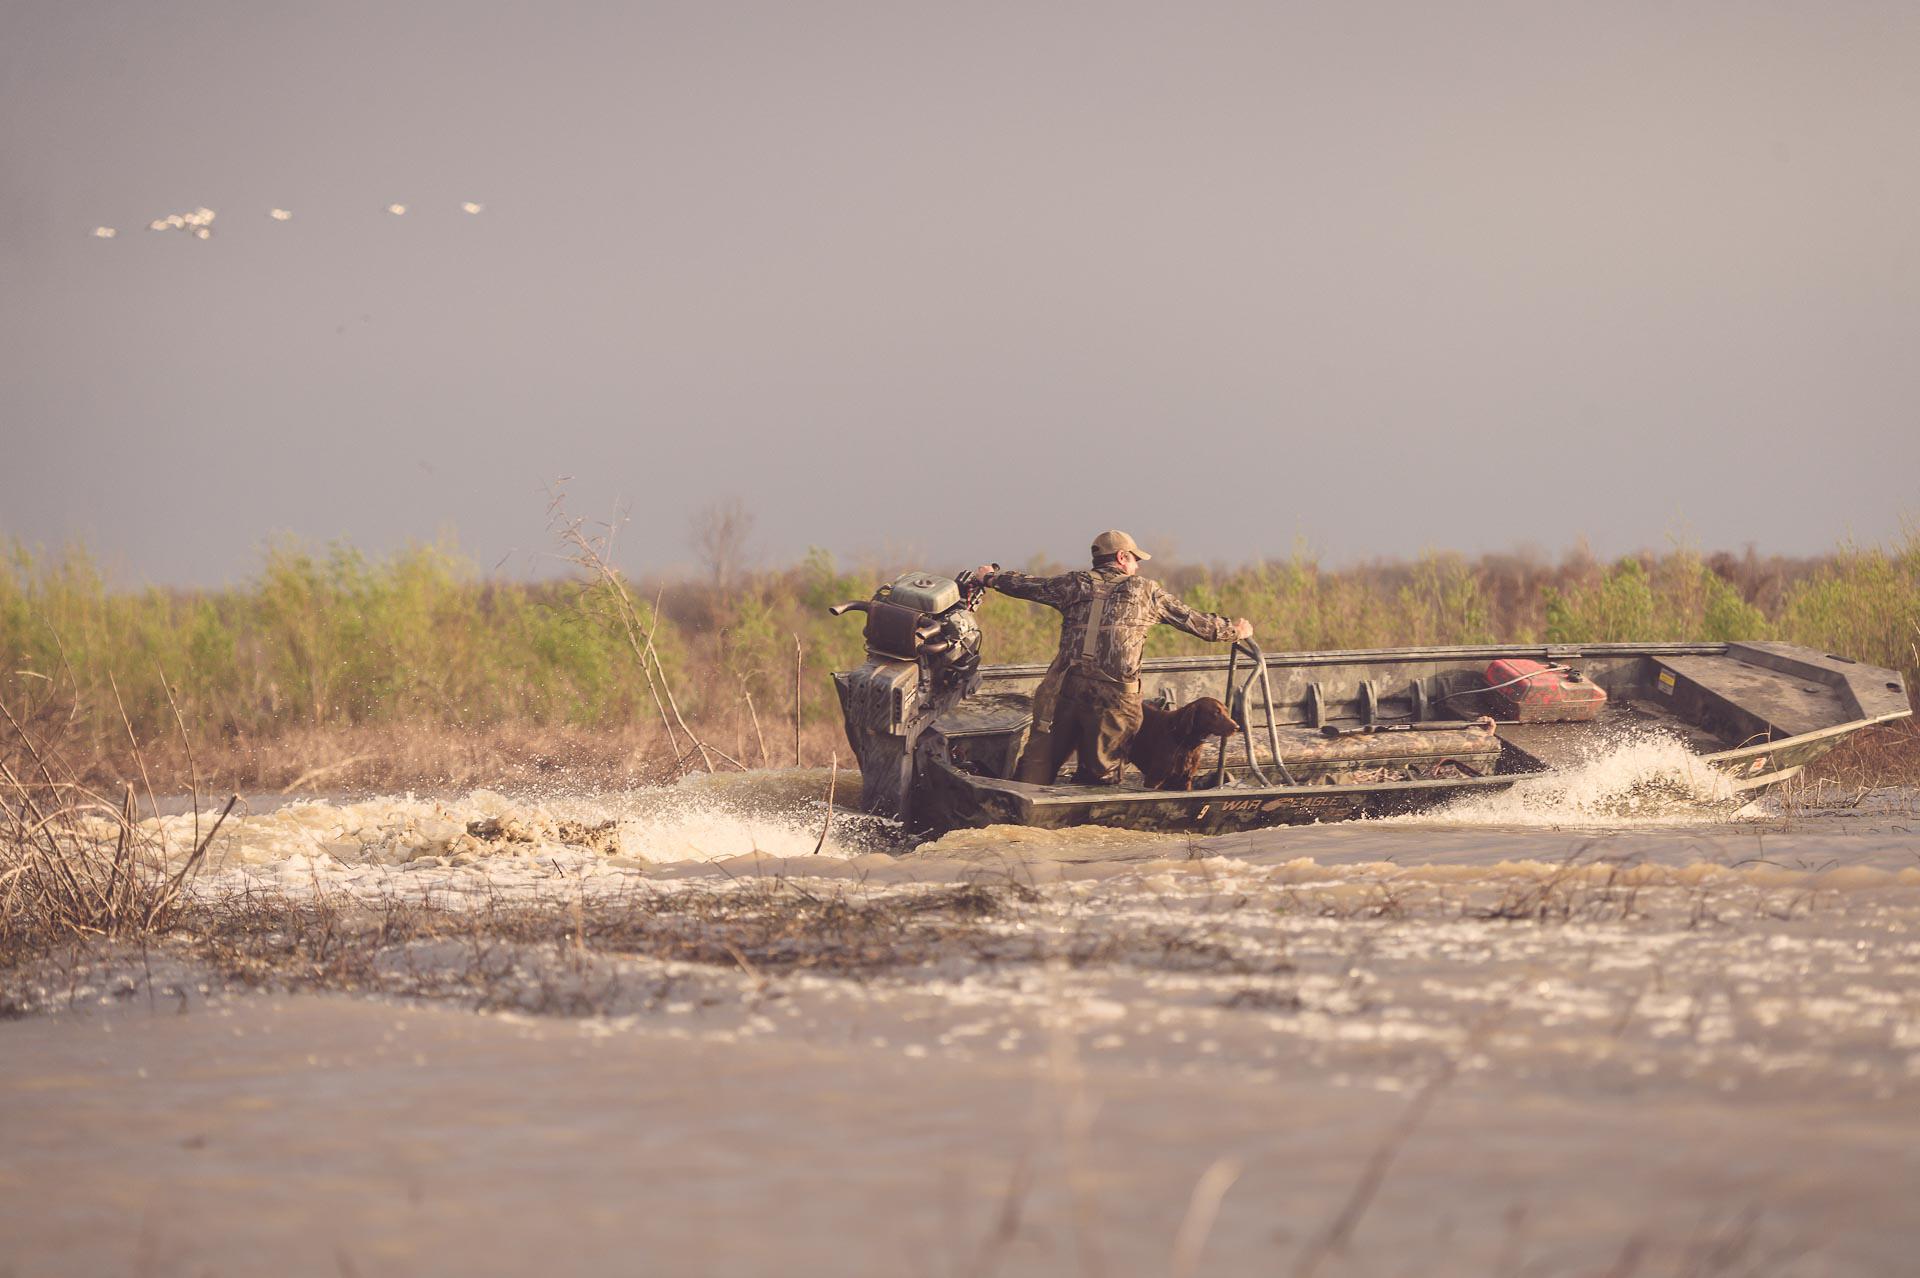 Duck hunter drives boat in marsh. © Tony Bynum